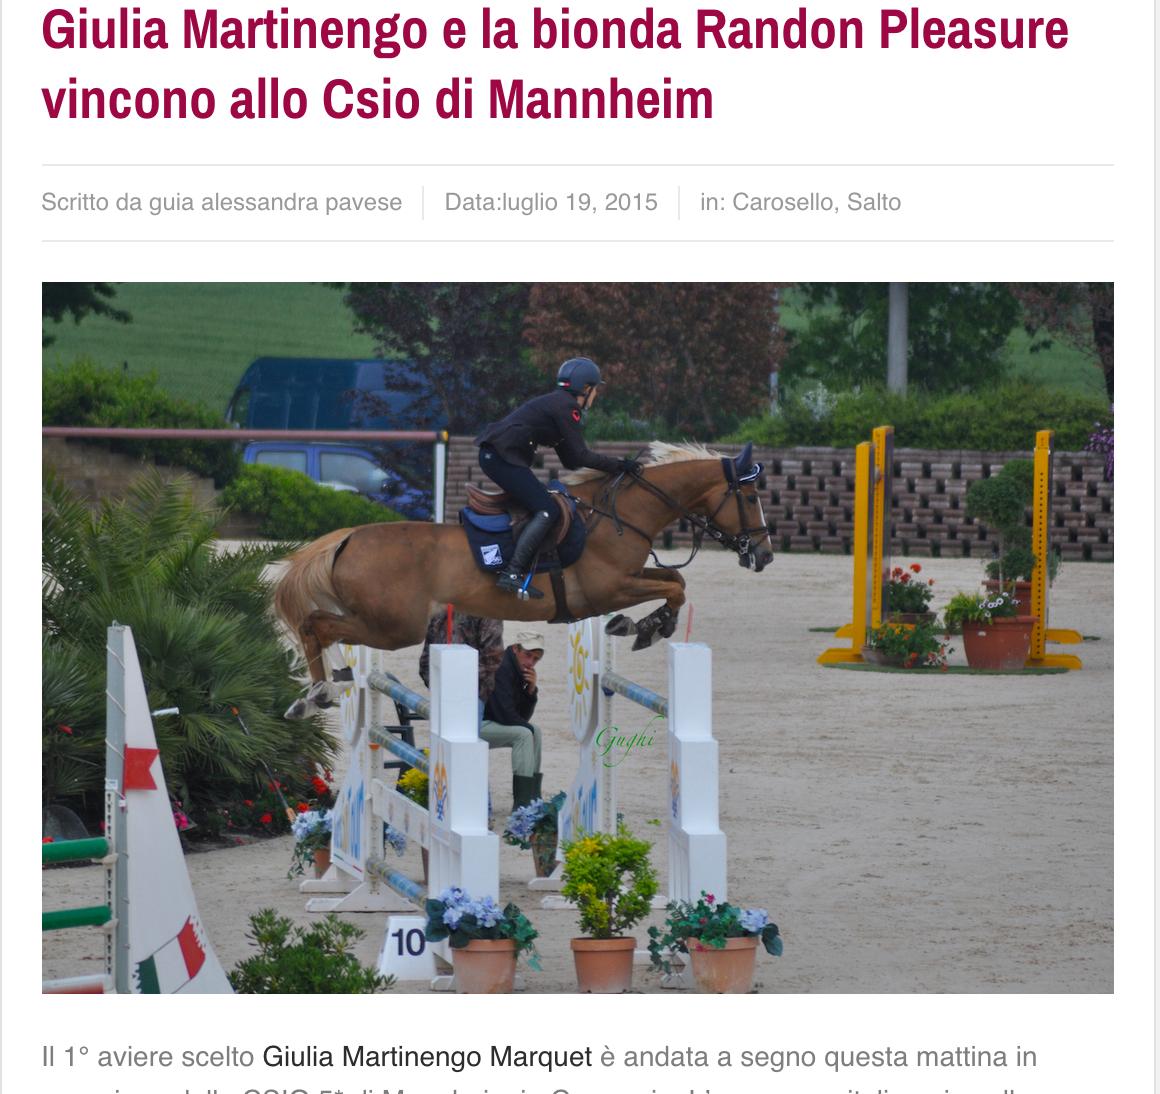 giulia martinengo_randon pleasure_mannheim_dothorse